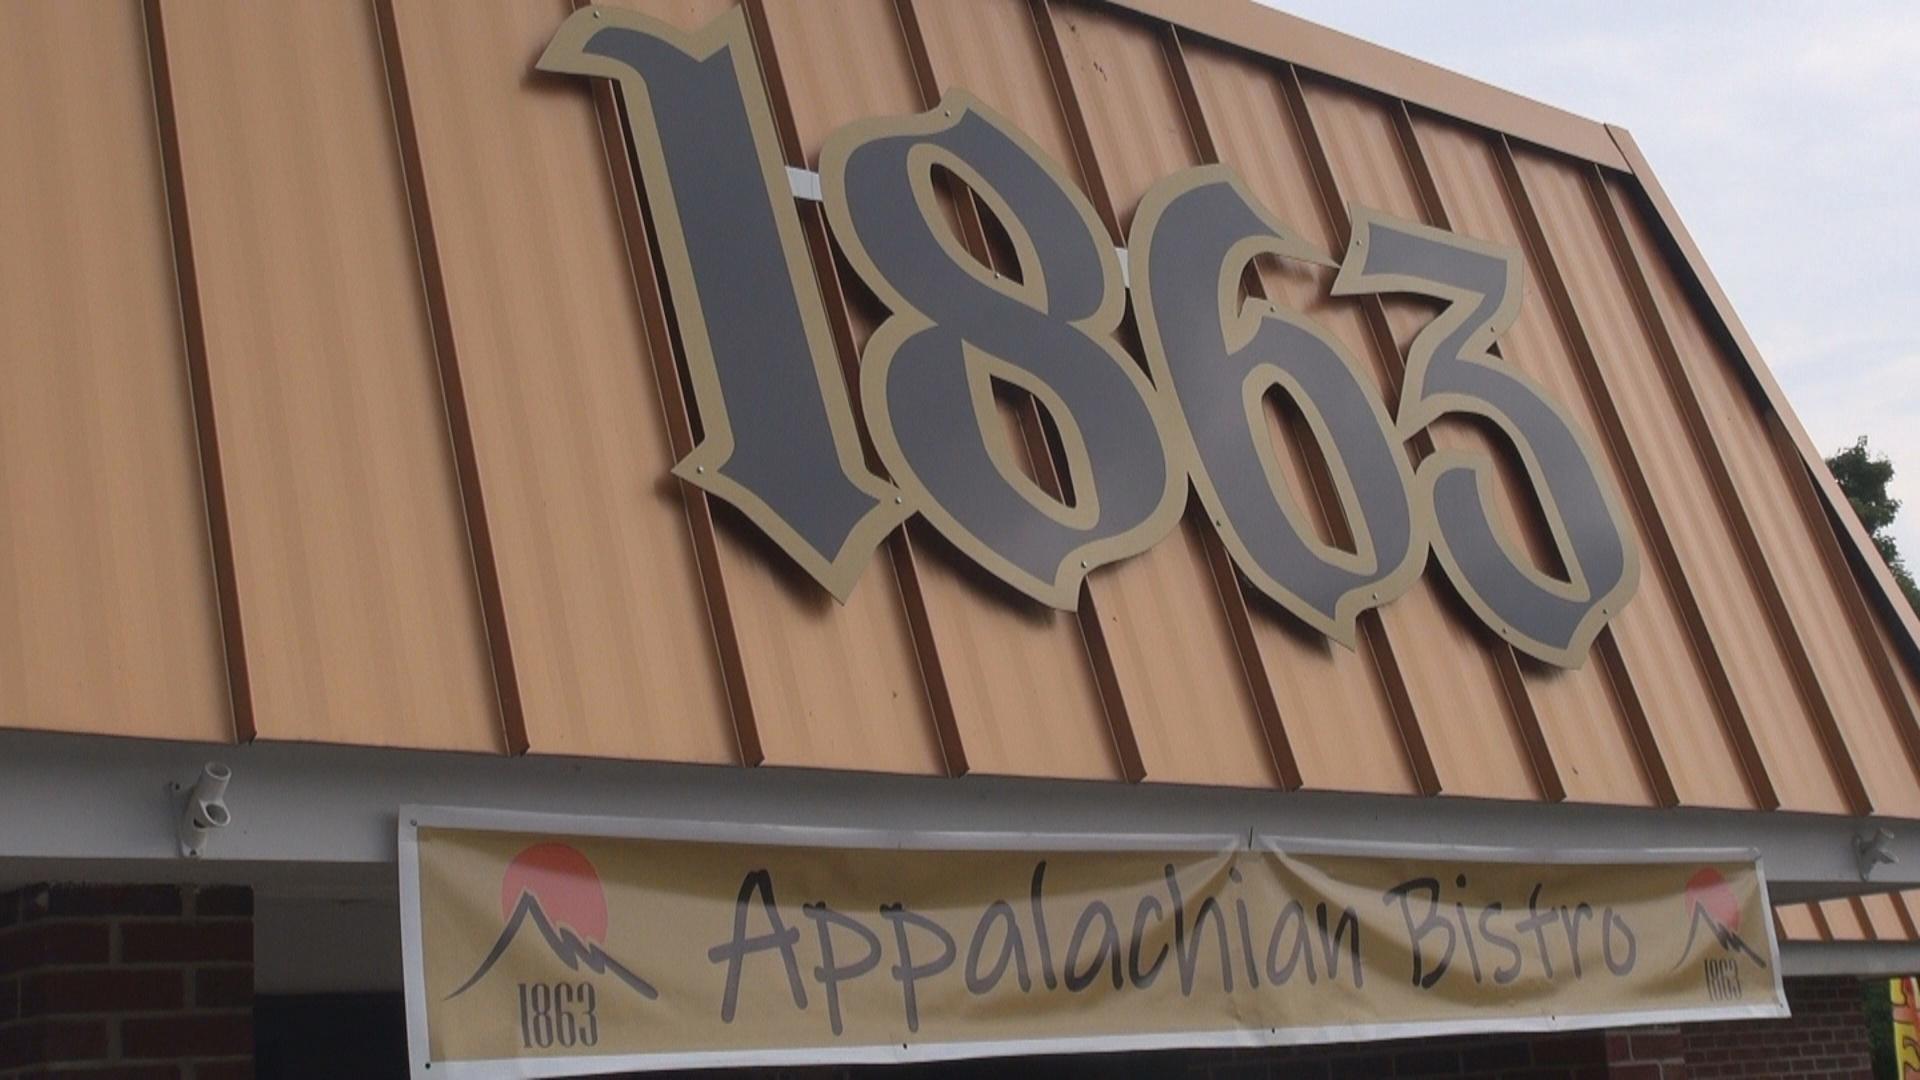 Restaurant Road Trip: 1863 Appalachian Bistro